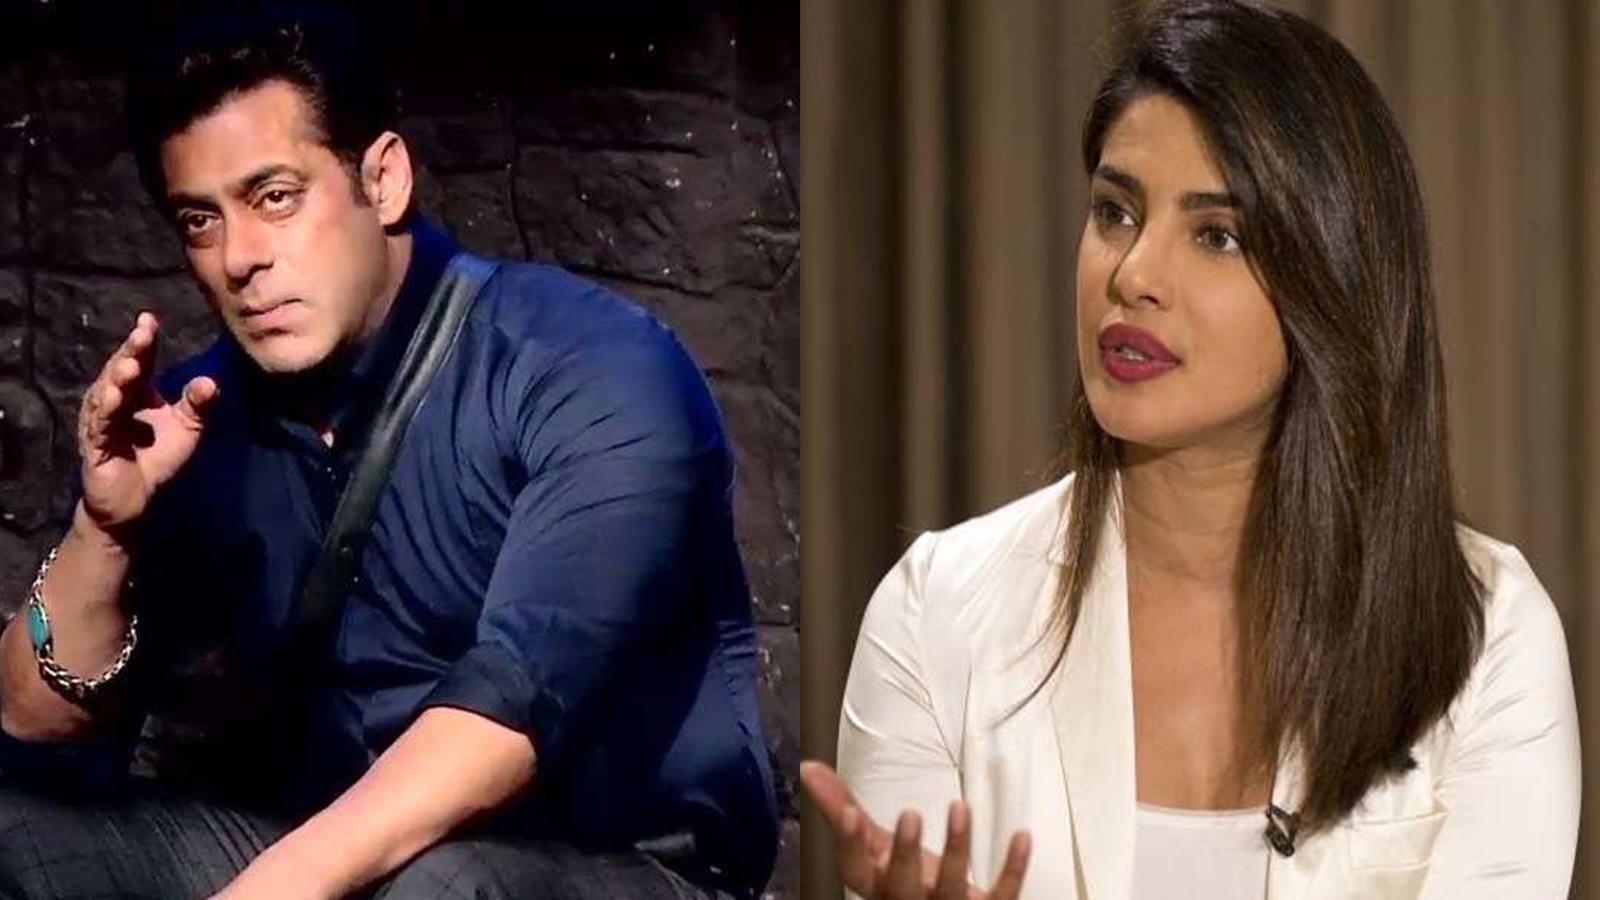 Salman Khan reveals it was Priyanka Chopra who showed interest to work in 'Bharat'